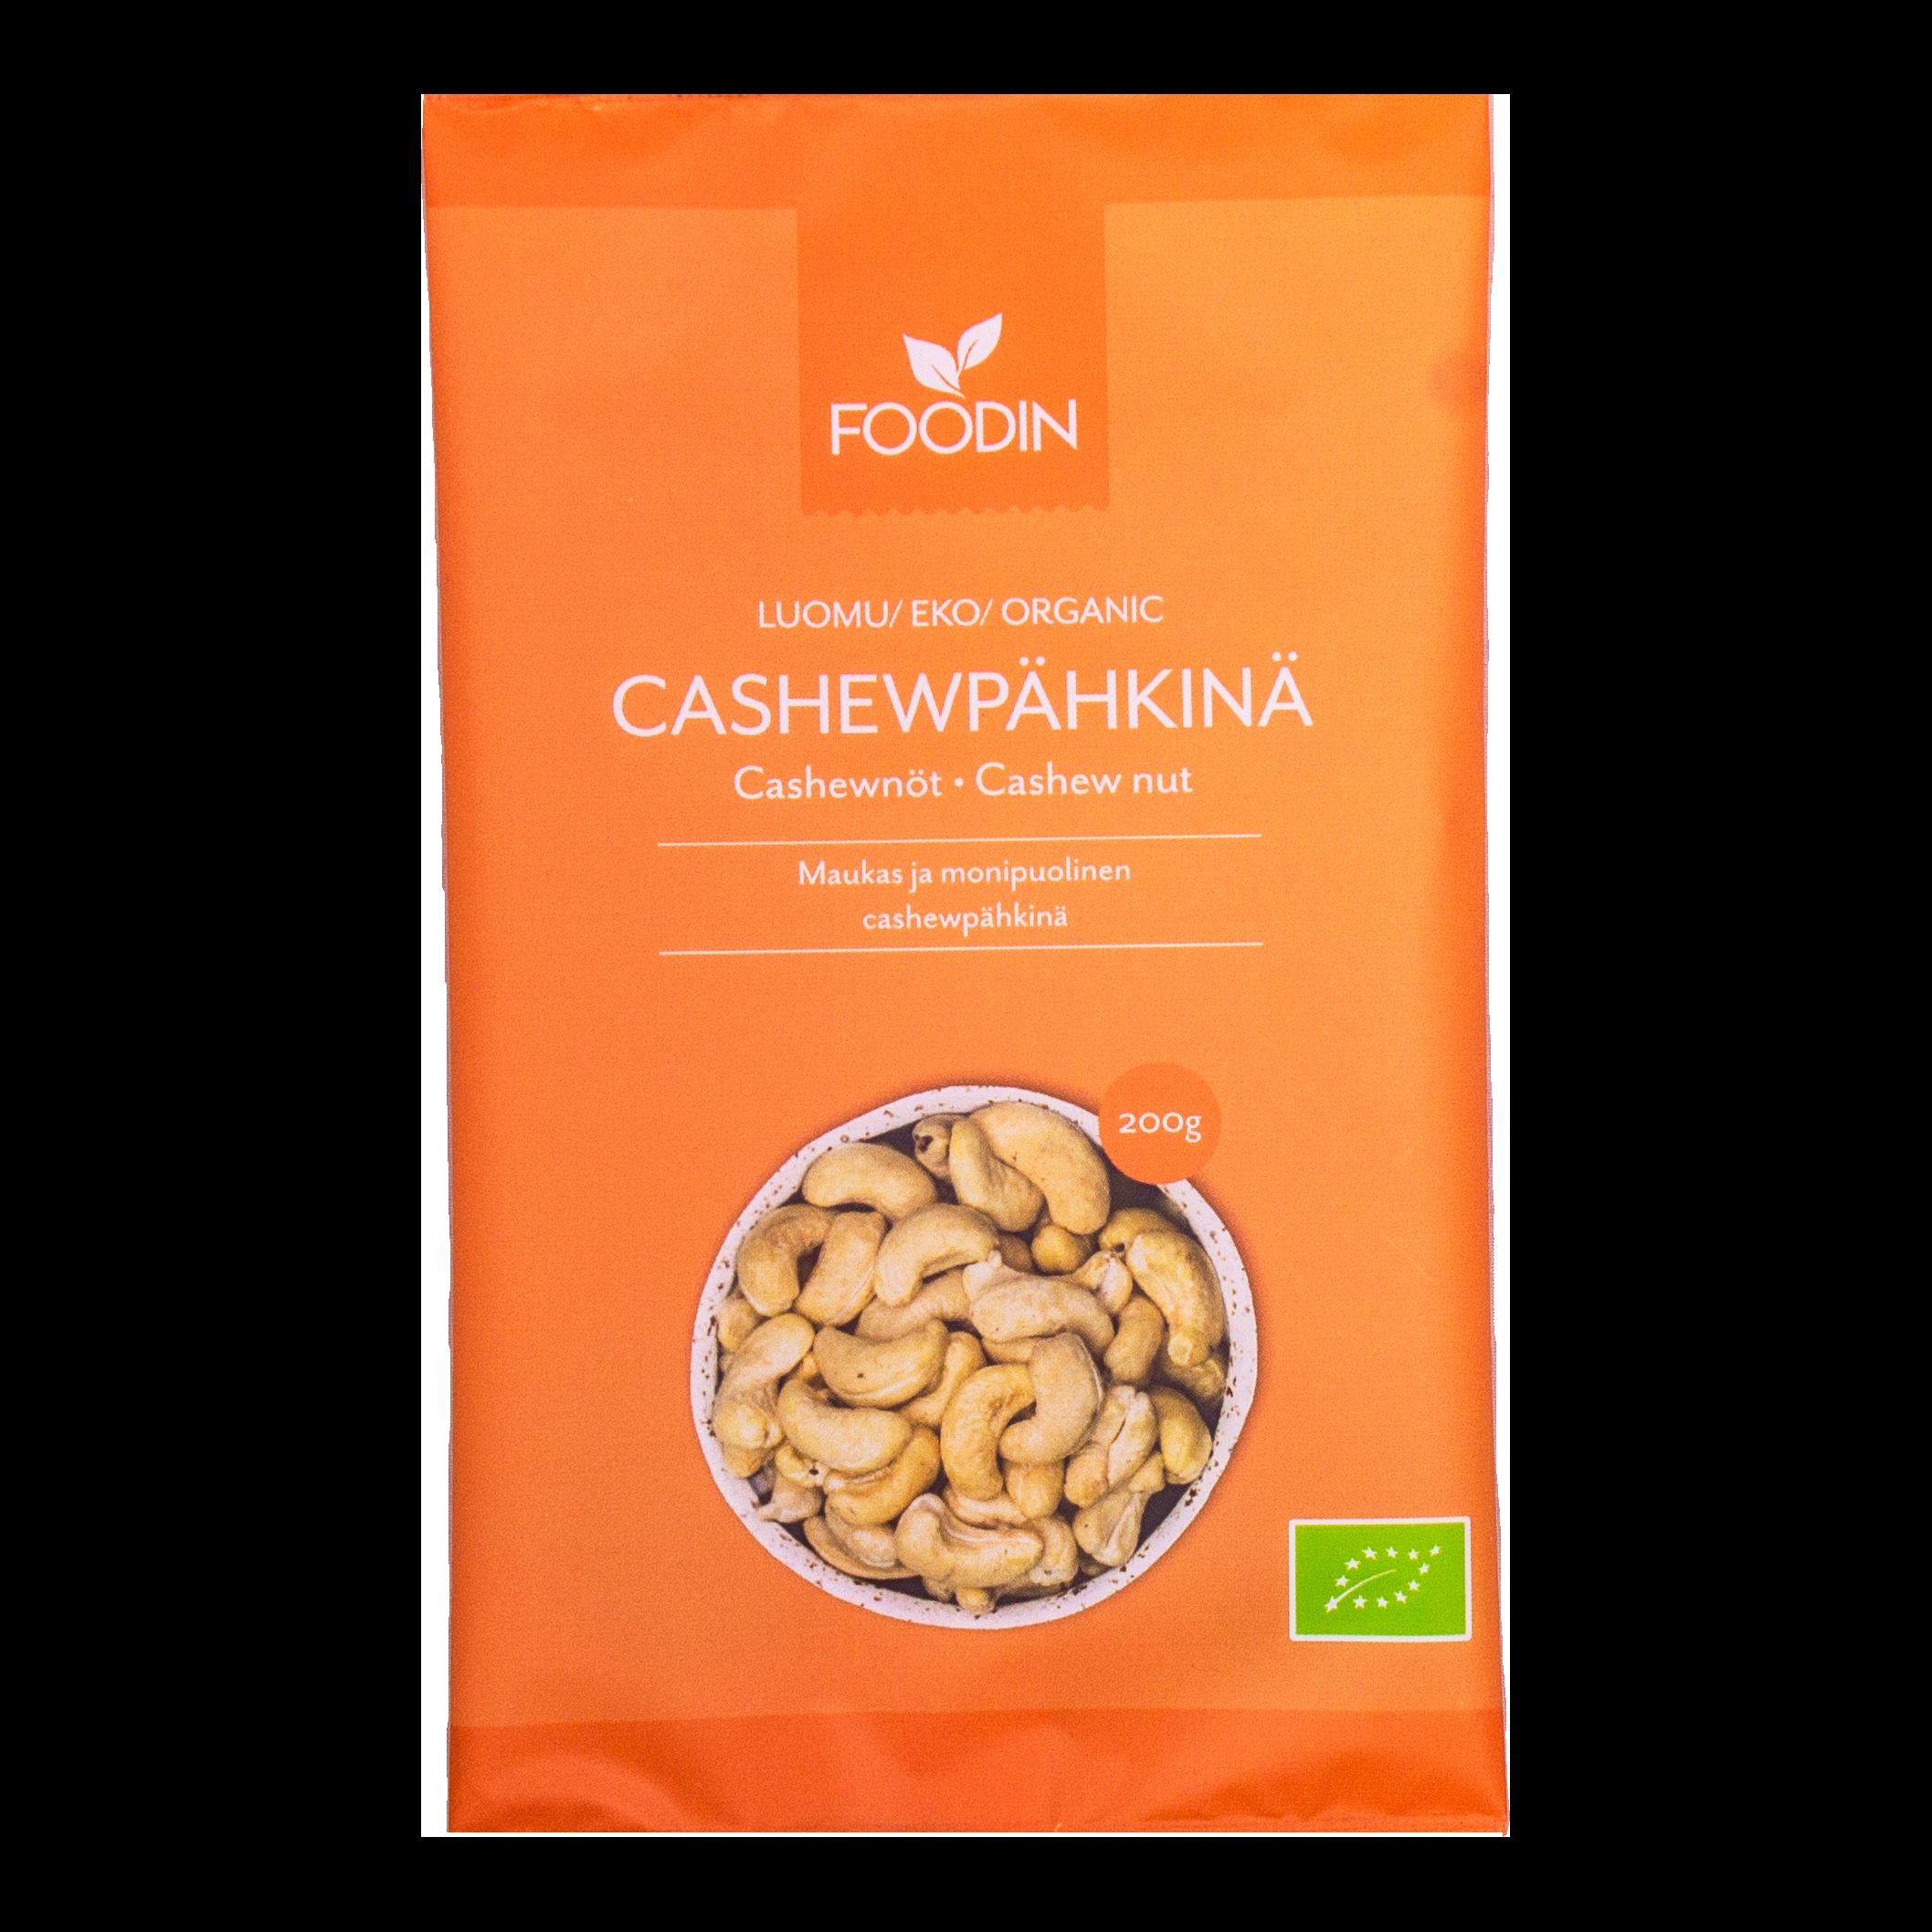 Cashewpähkinä, luomu, 200g